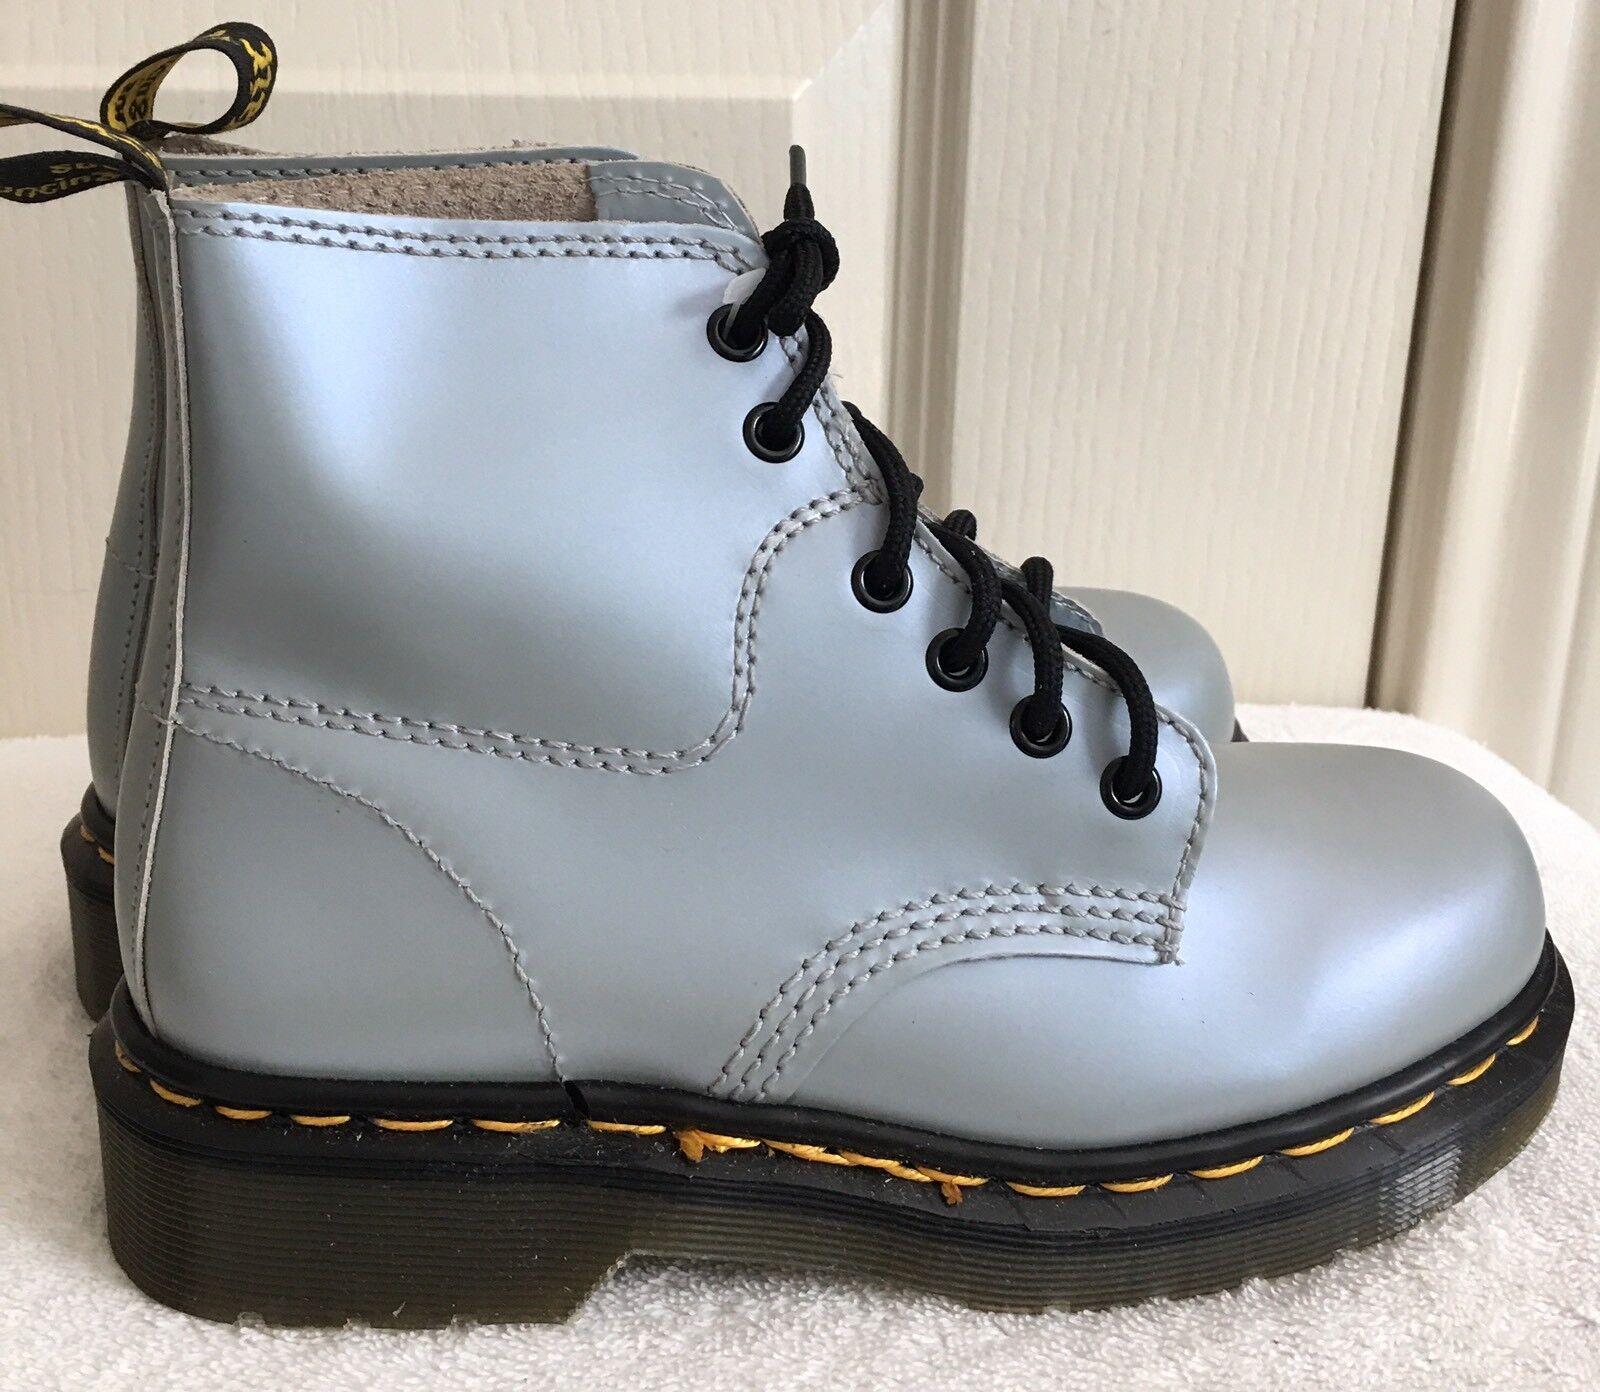 Womens DR. MARTENS 8175 6-Eye Metallic bluee-Silver Ankle Boots SIZE US 5 EU 36